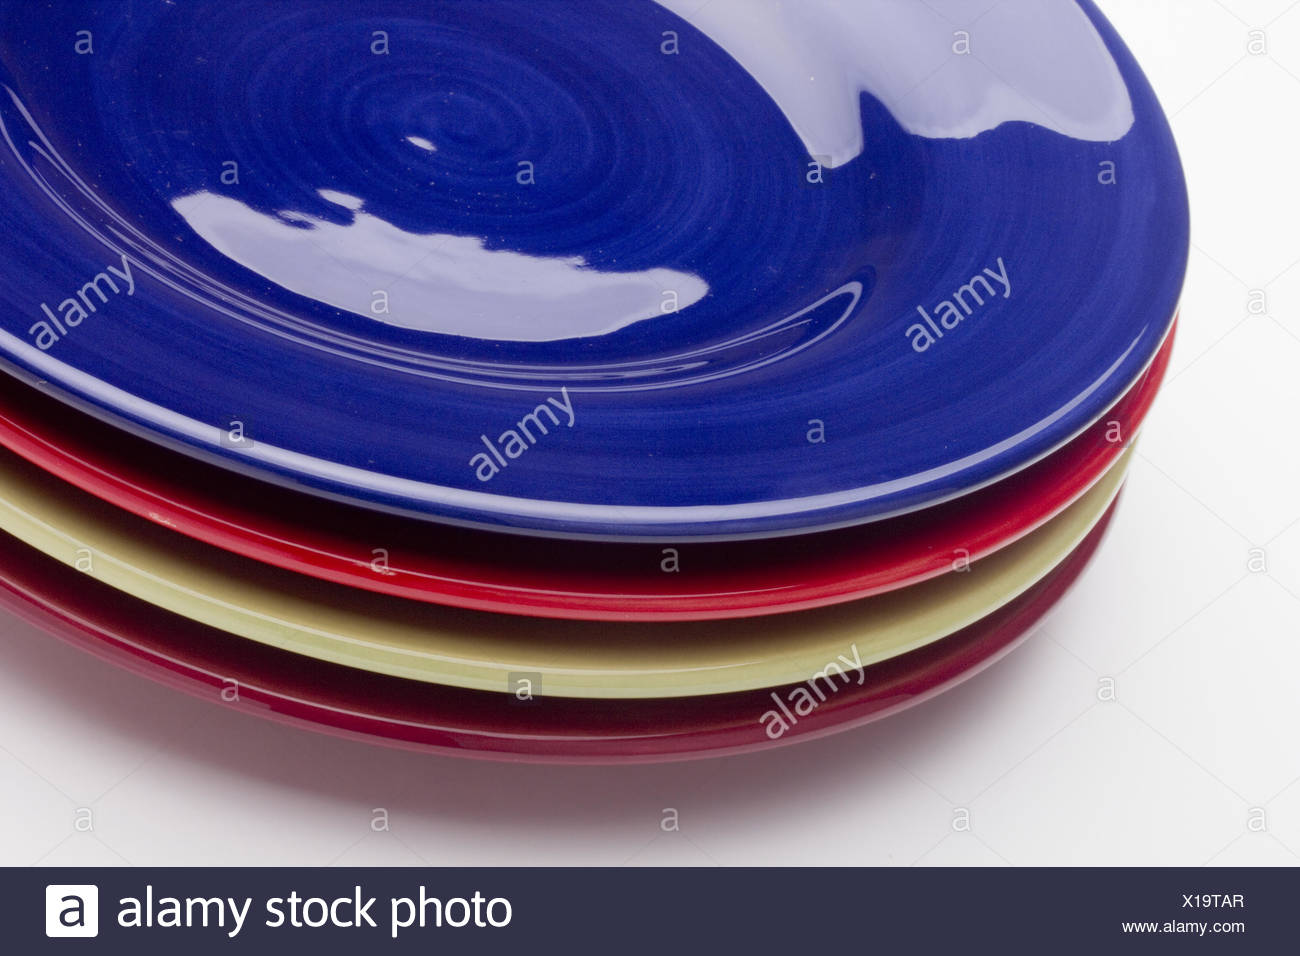 Ceramic plates - Stock Image